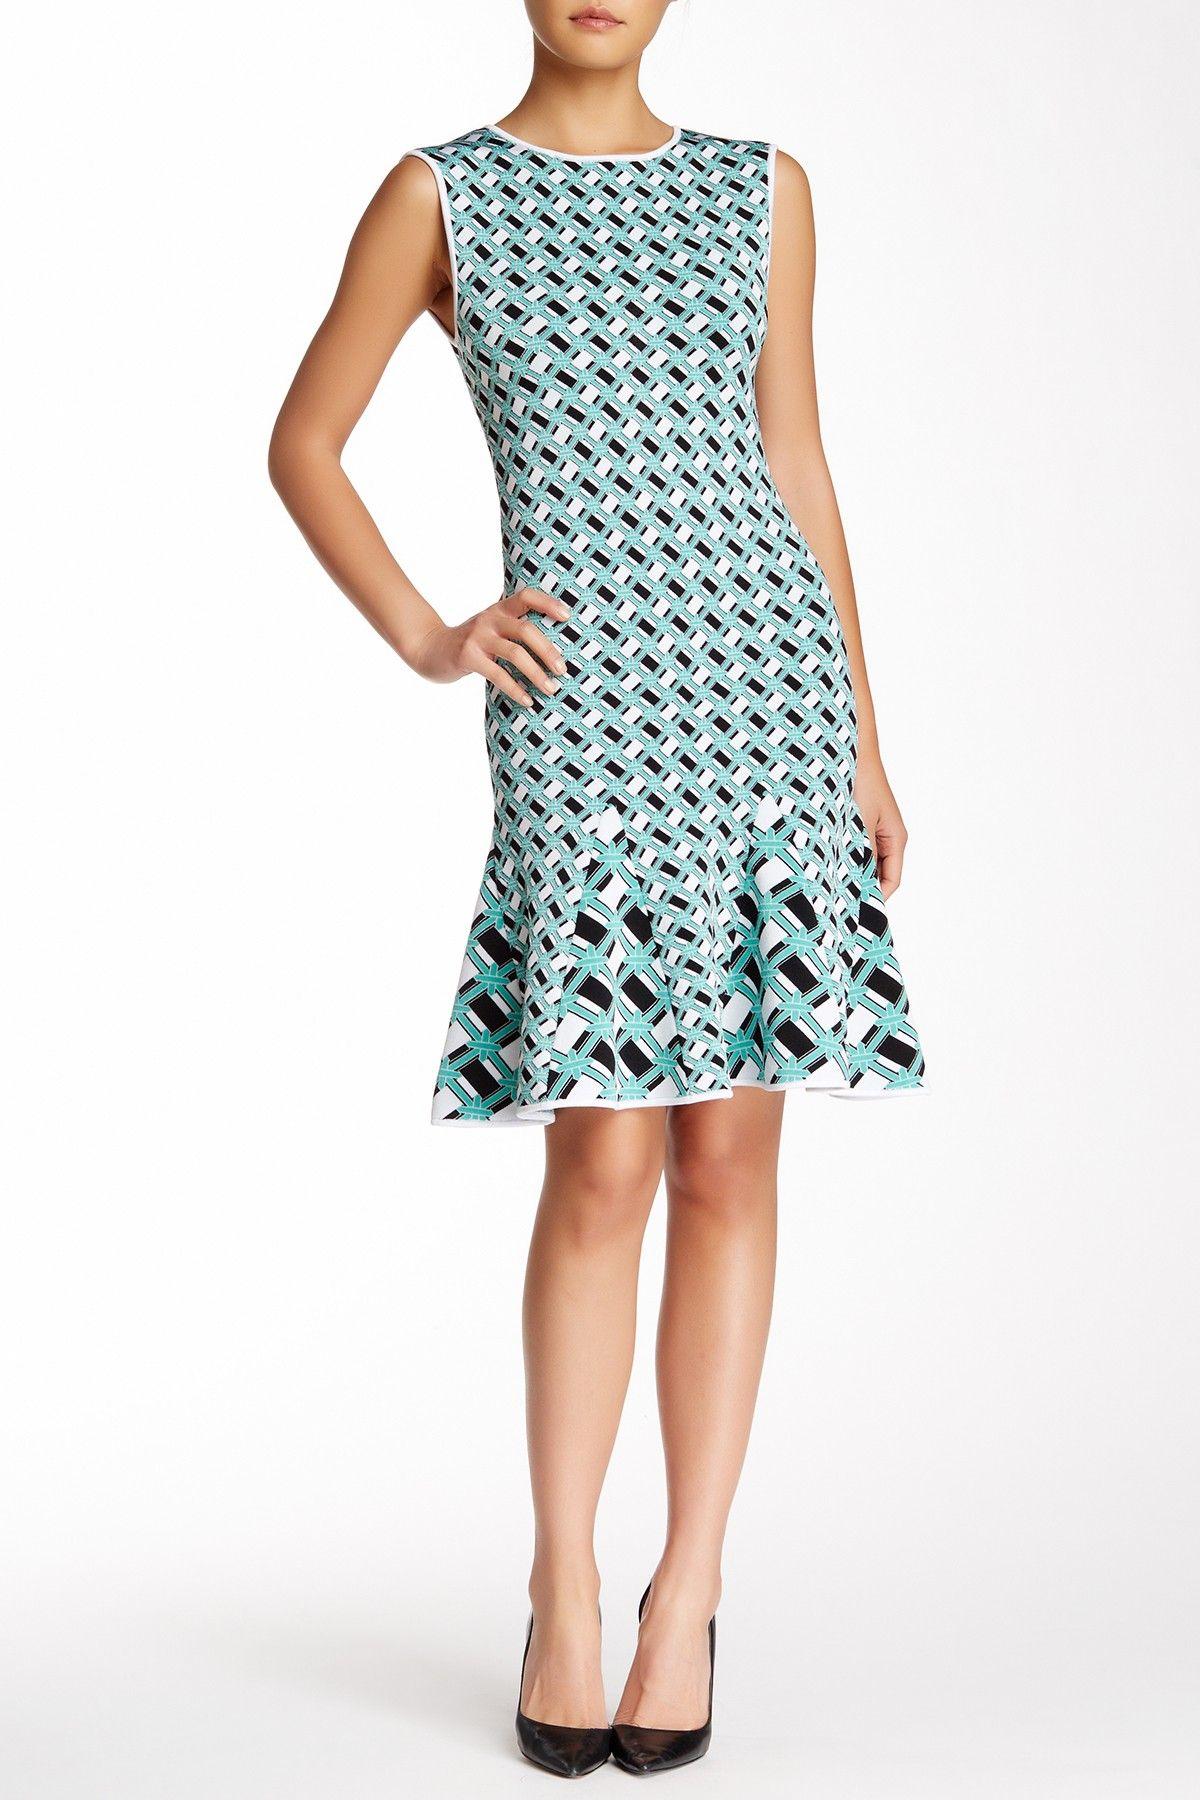 ZAC Zac Posen | Ines Dress | Zac posen, Nordstrom and Party dress ...